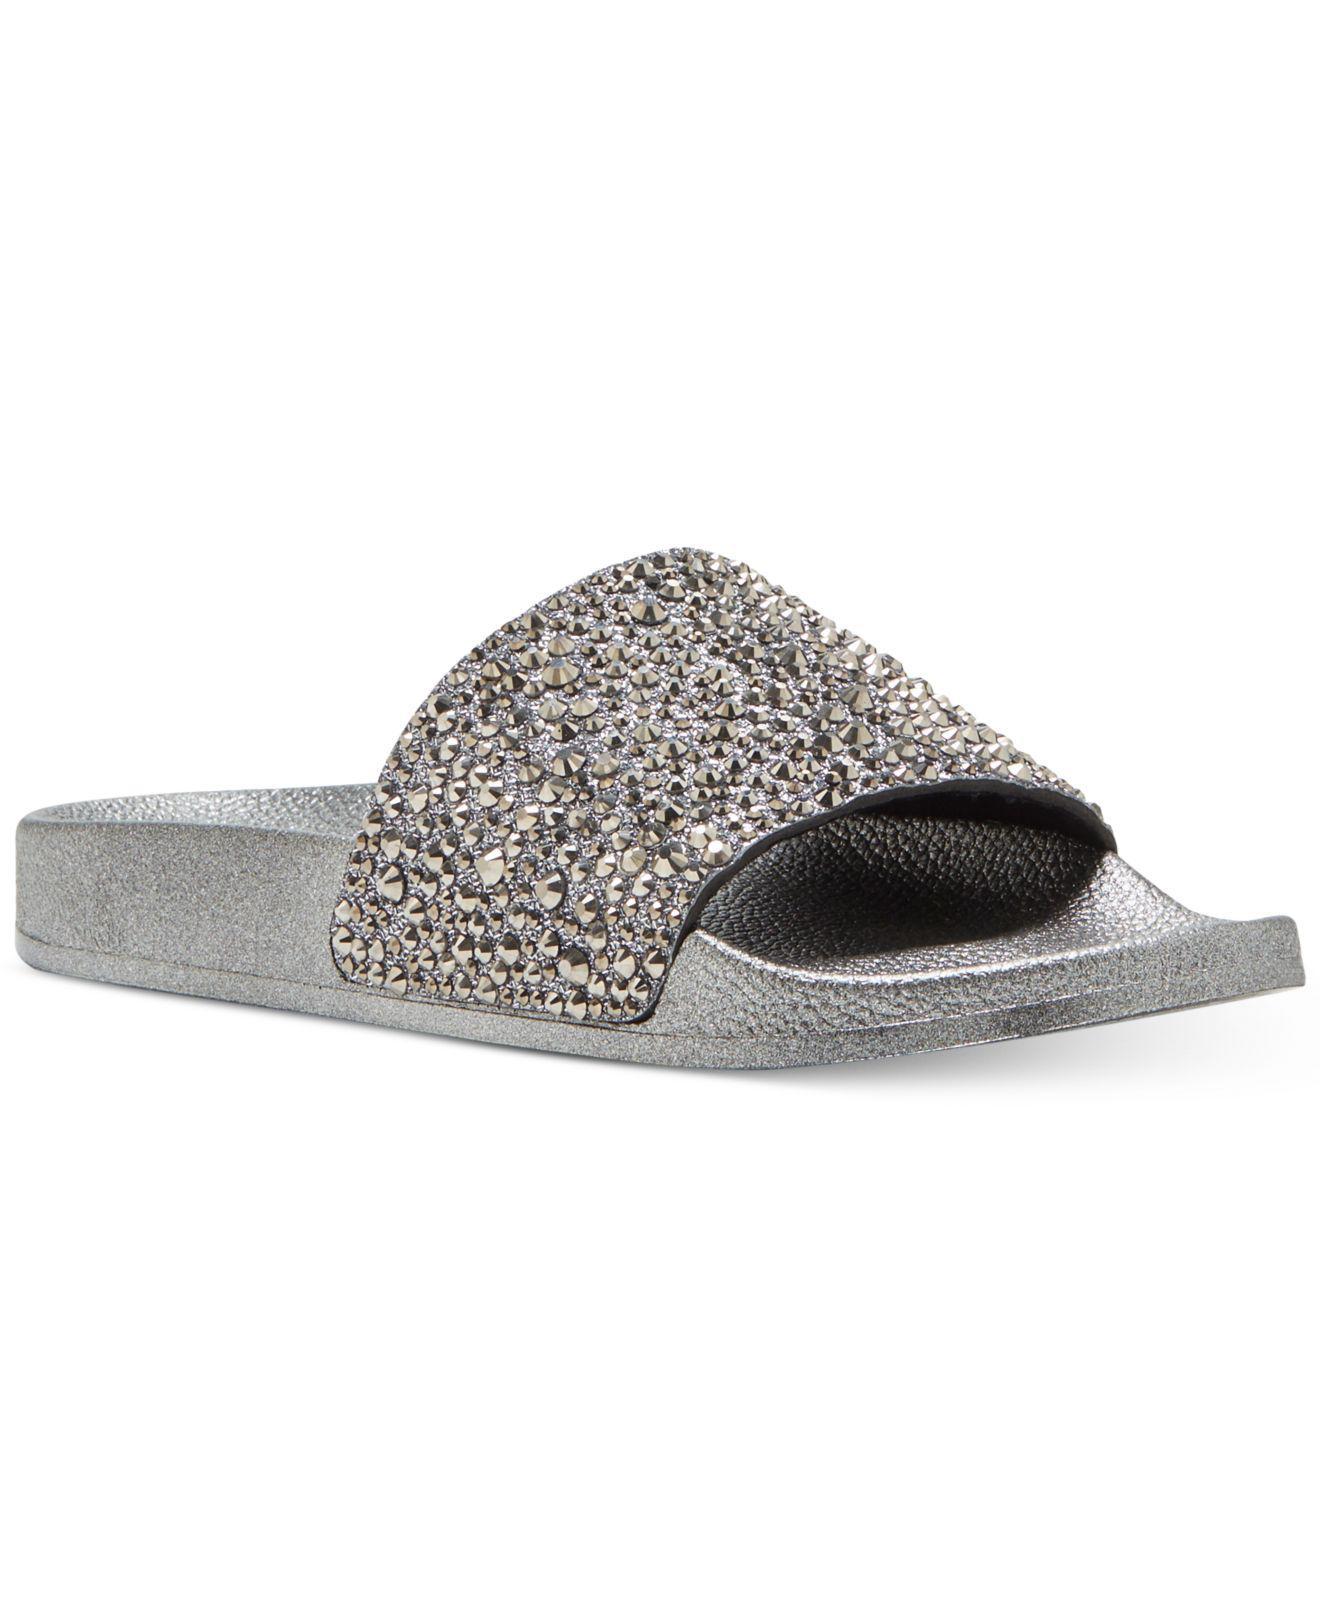 a421bc5c0 Lyst - INC International Concepts Women s Peymin Flat Slide Sandals